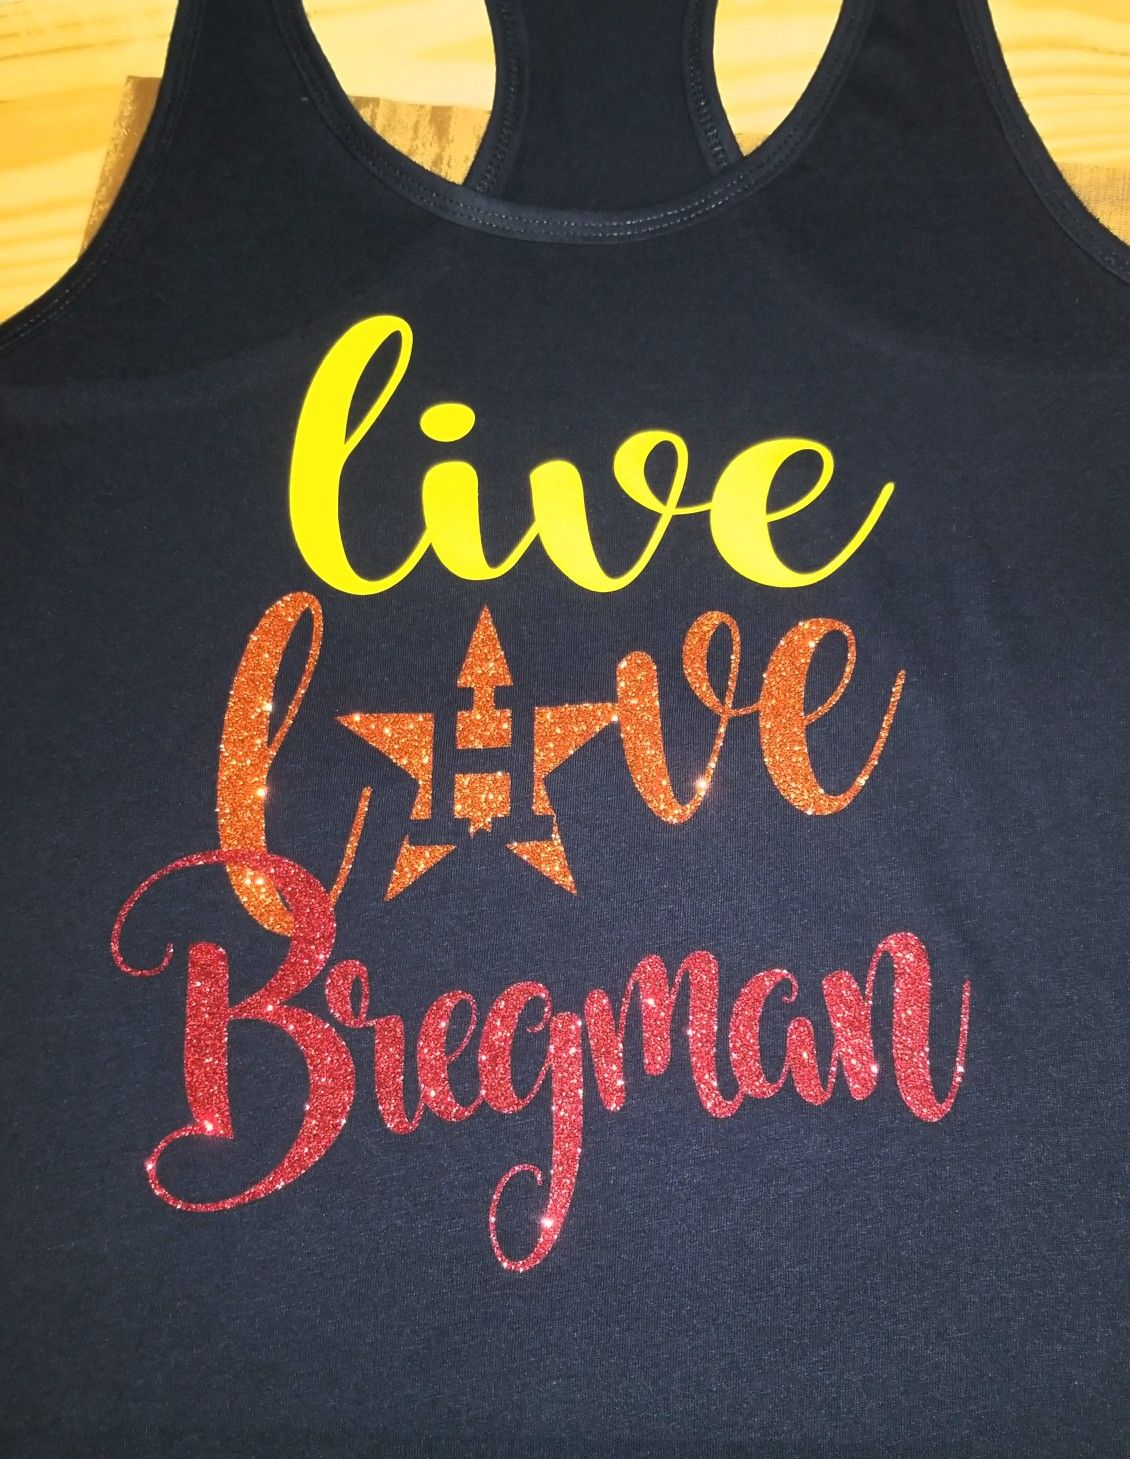 new concept e7c9e a5add ♡♡ these Bregman shirts! Bling Dream Reality on FB!! | I ...